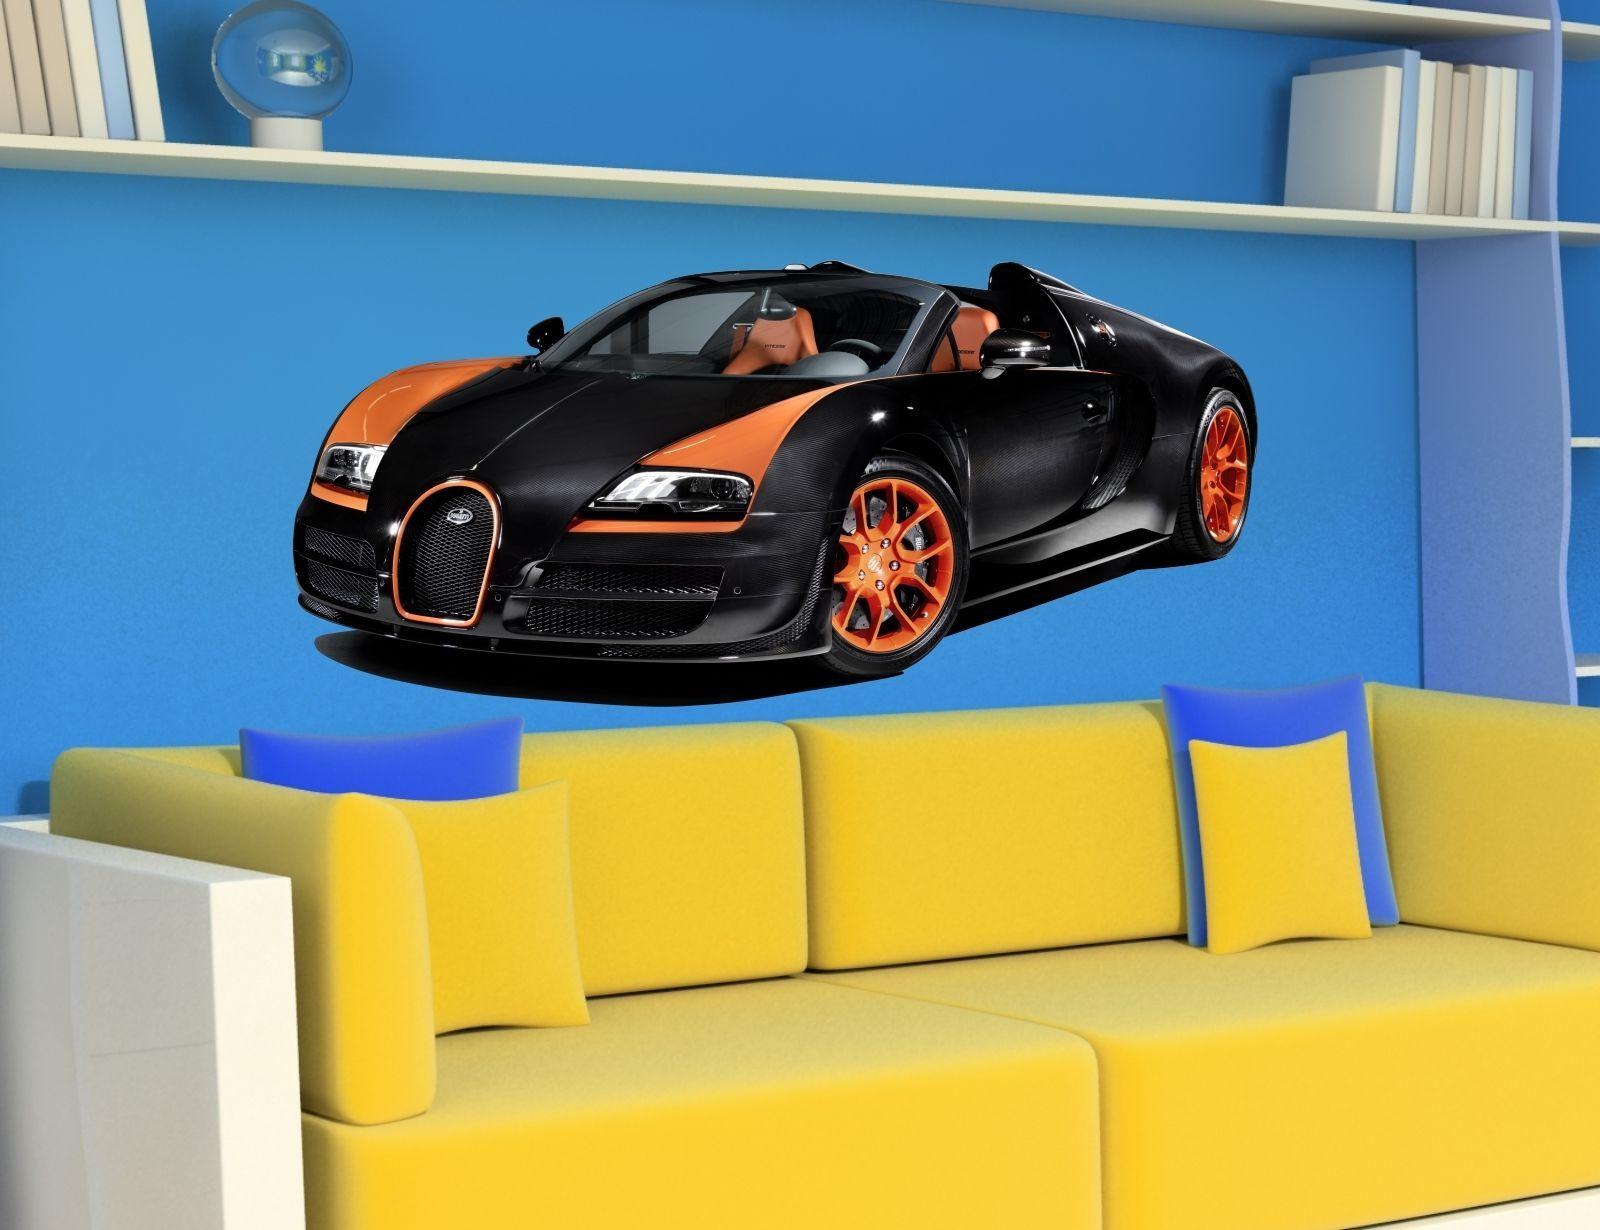 5 99 Gbp Wall Stickers Cars Bugatti Veyron Grand Sport Vitesse Sticker Car Decal Room E Cars Bugatti Veyron Bugatti Cars Bugatti Veyron Grand Sport Vitesse [ 1230 x 1600 Pixel ]